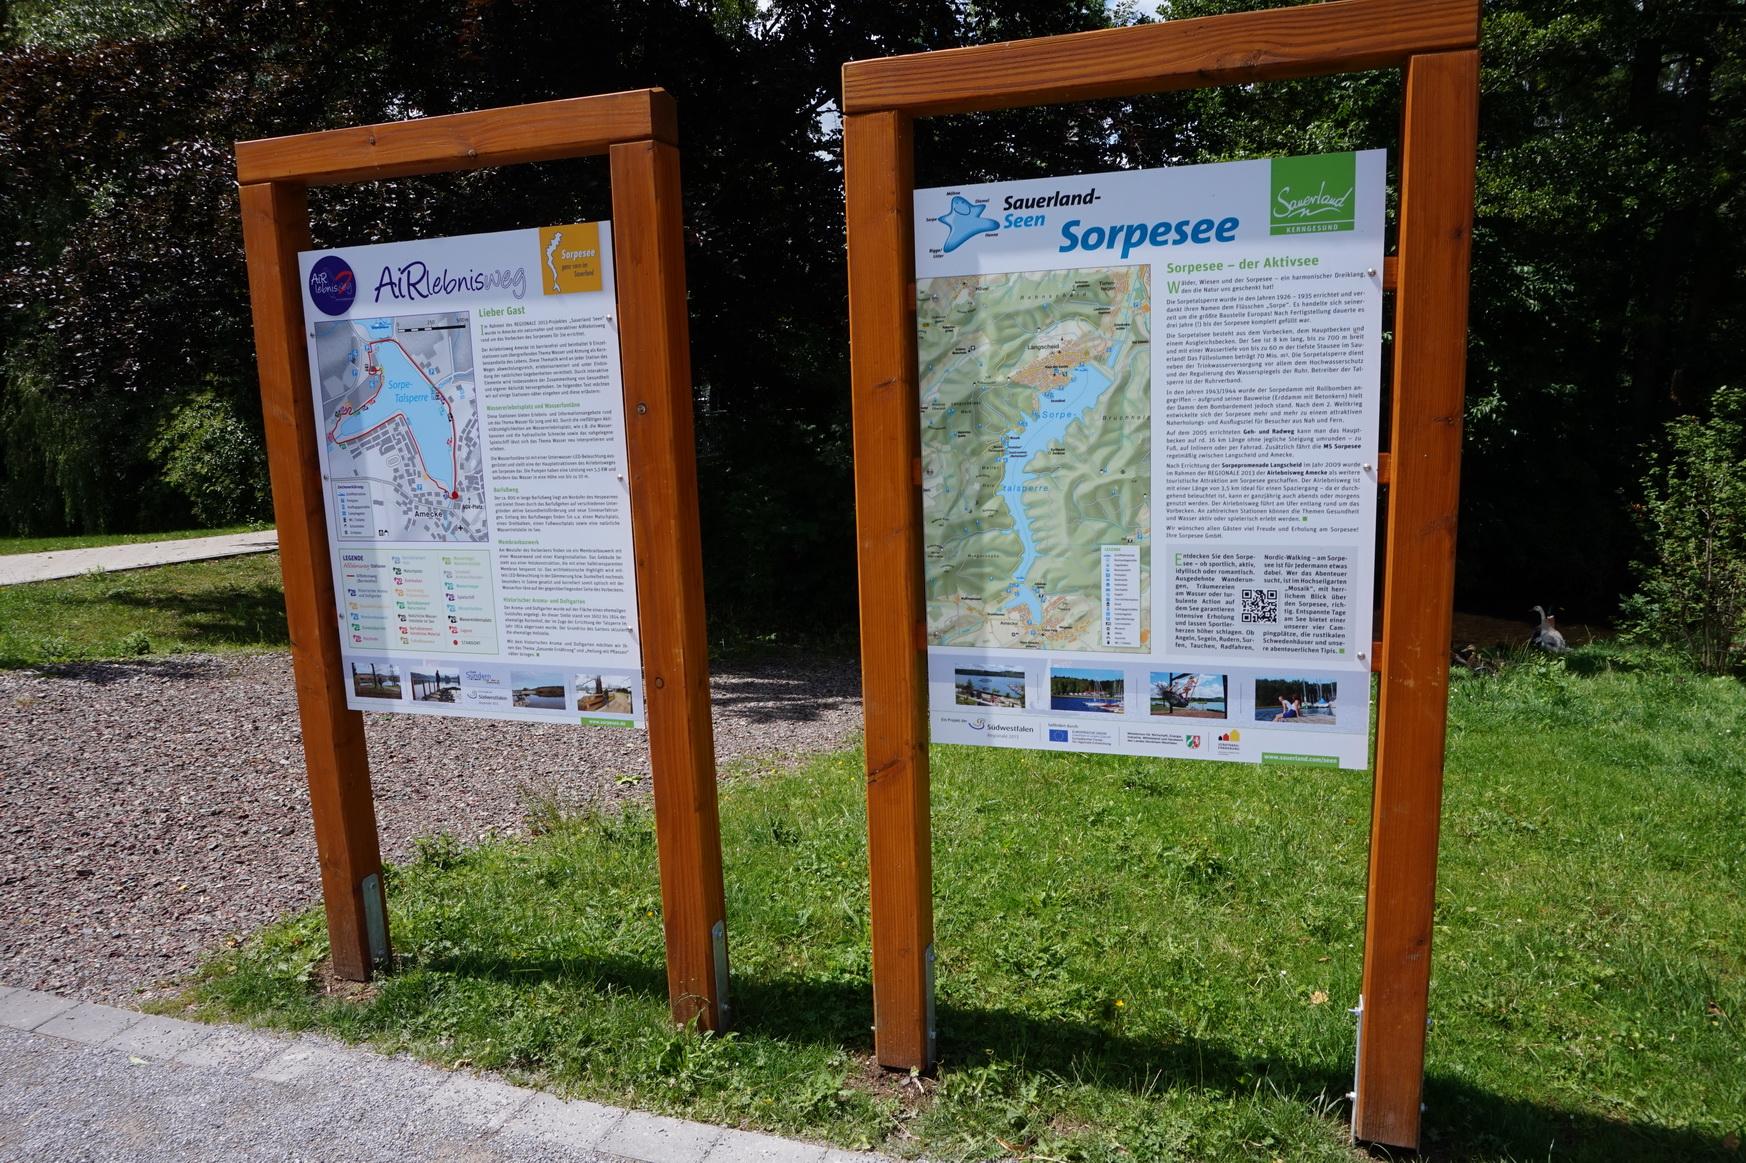 Wanderung Am2 Amecke Sauerland 29